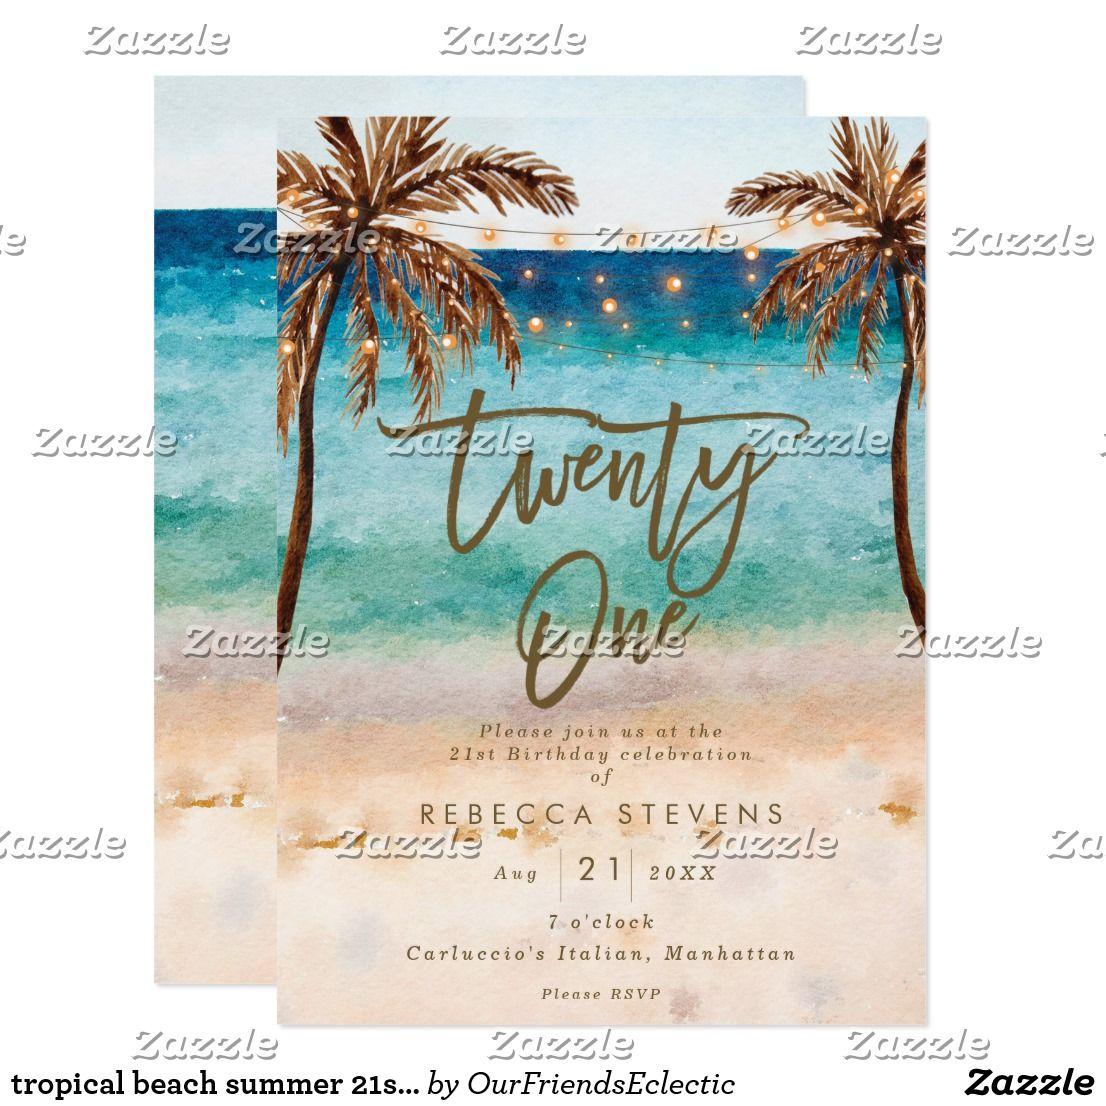 Painted Tropical Destination Island Sea Palm Tree Wedding Invitation and RSVP Postcard Suite  Deposit Beach Bliss